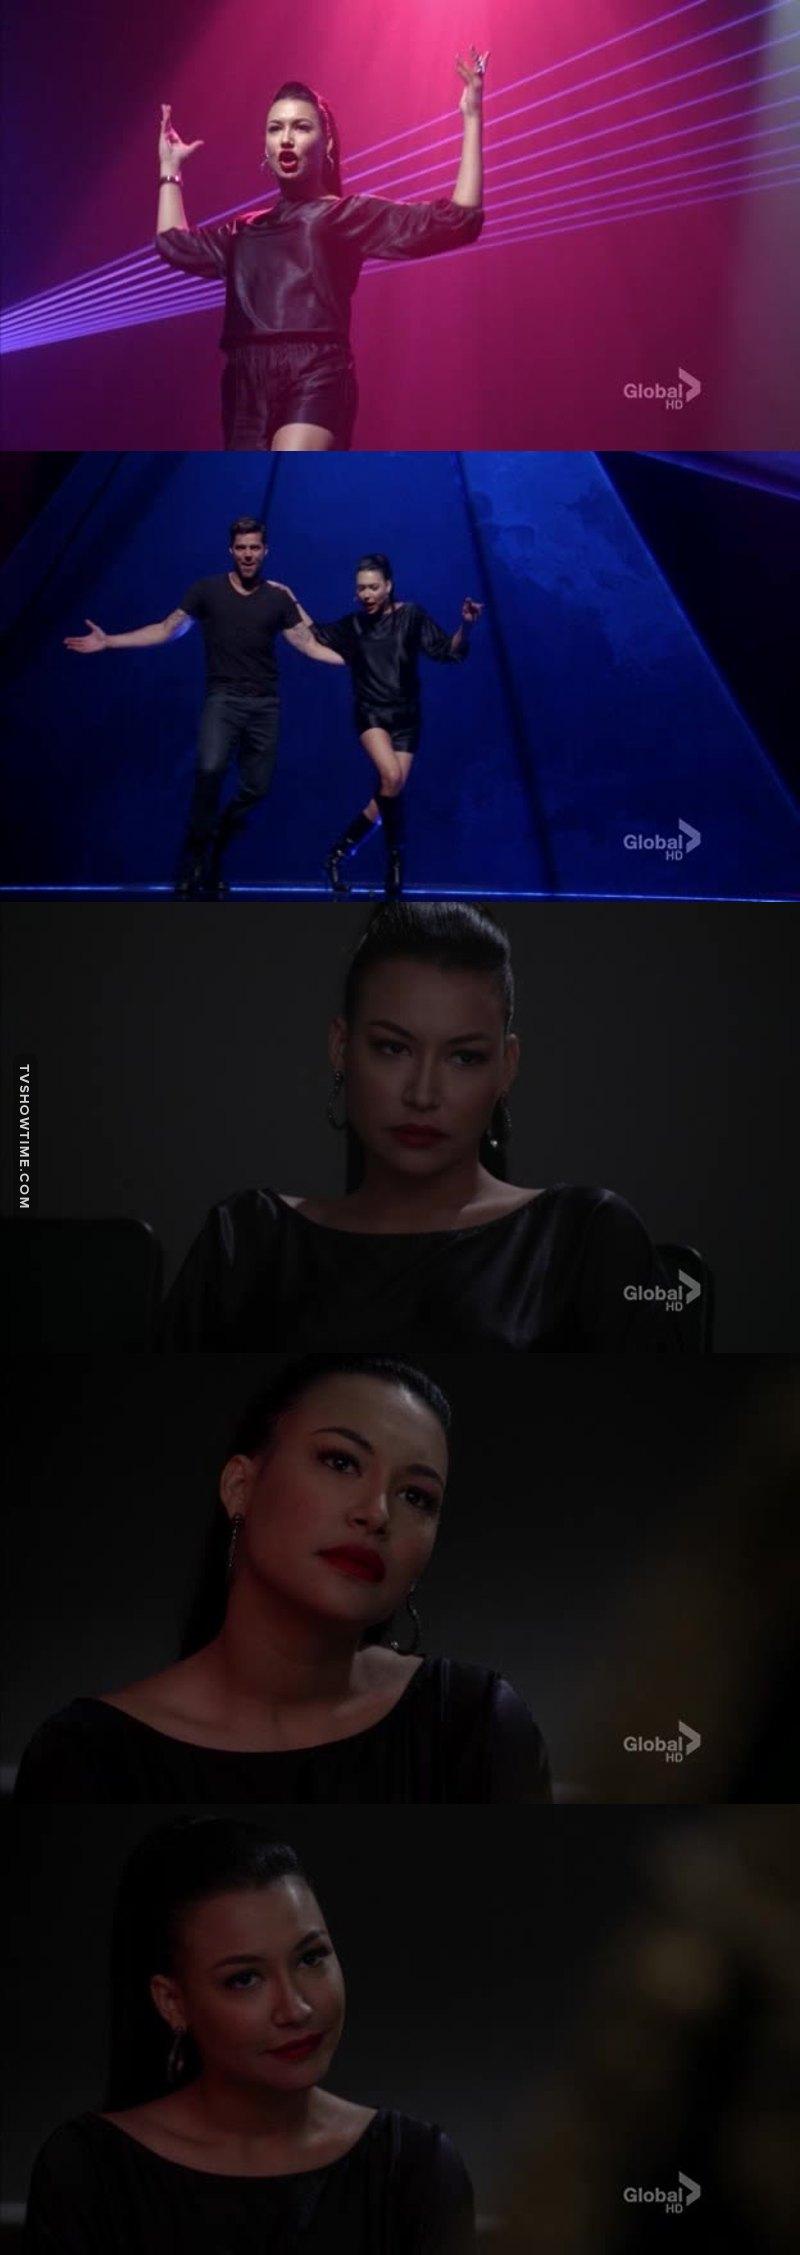 Santana always stole the scene